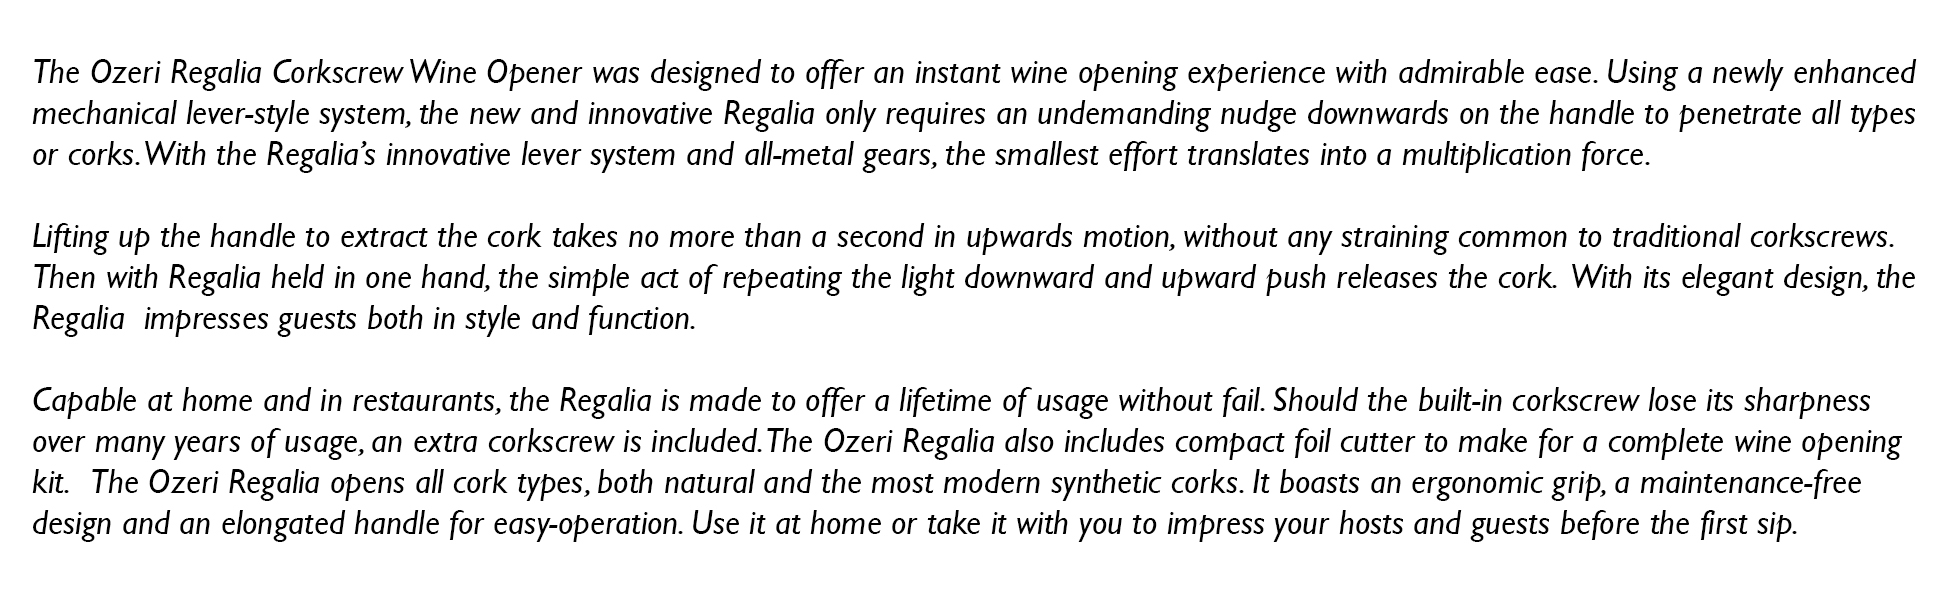 Ozeri REGALIA Corkscrew Wine opener